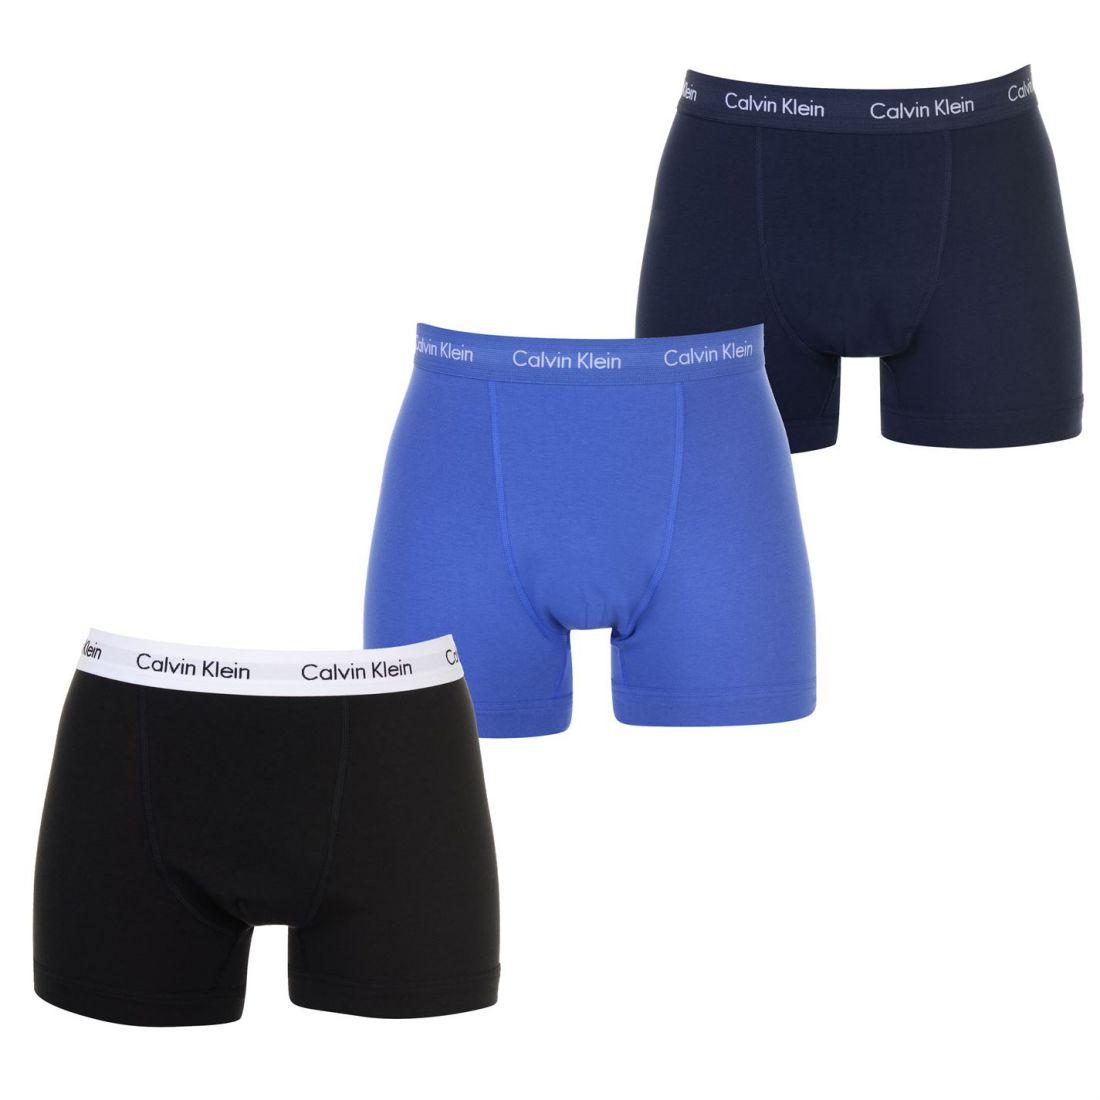 4e1e42b43 Mens Calvin Klein 3 Pack Trunks Underwear Elasticated Waist New ...